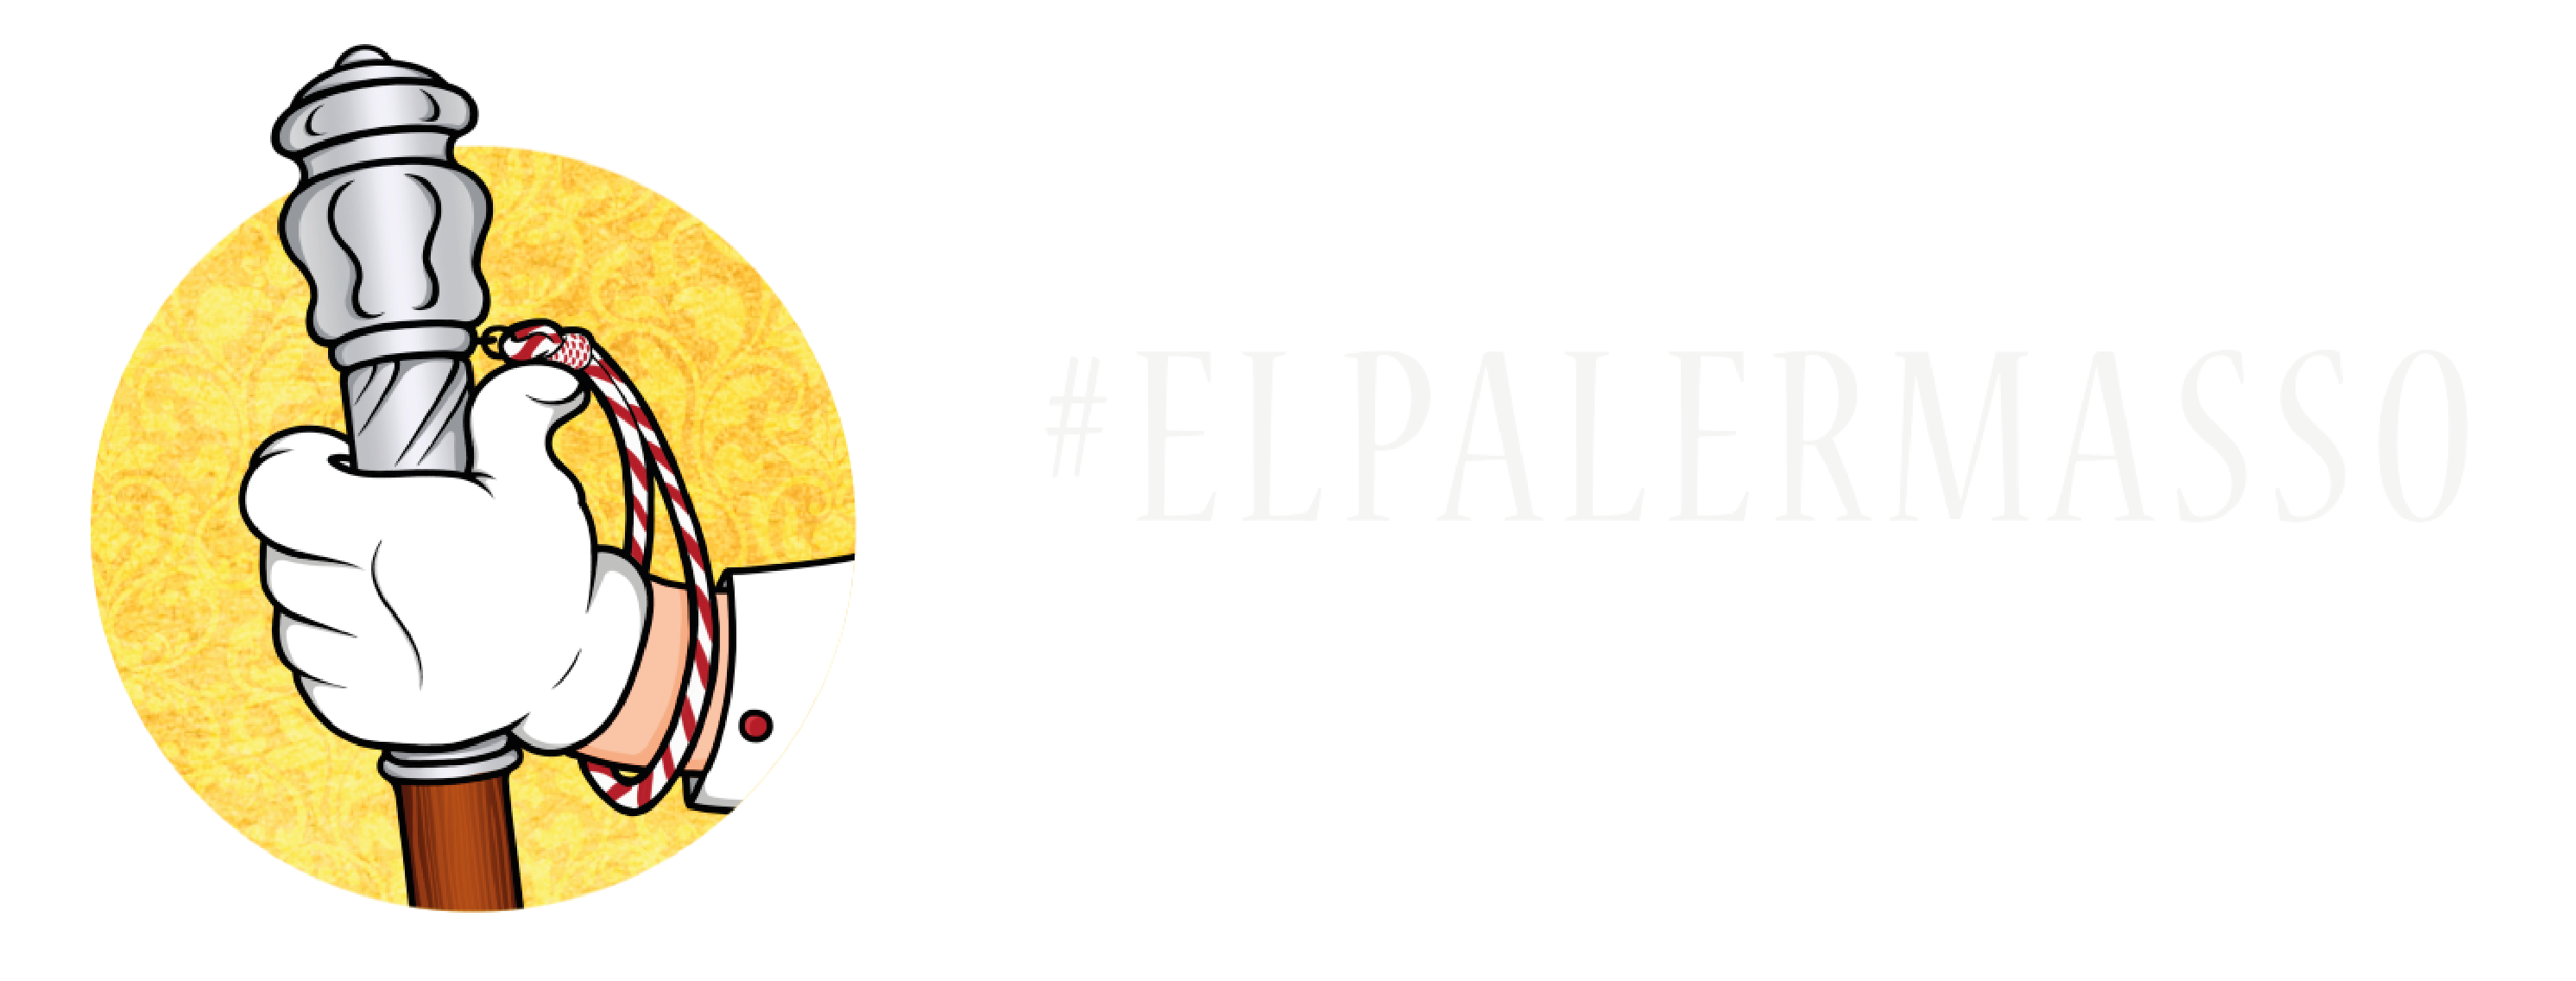 EL PALERMASSO